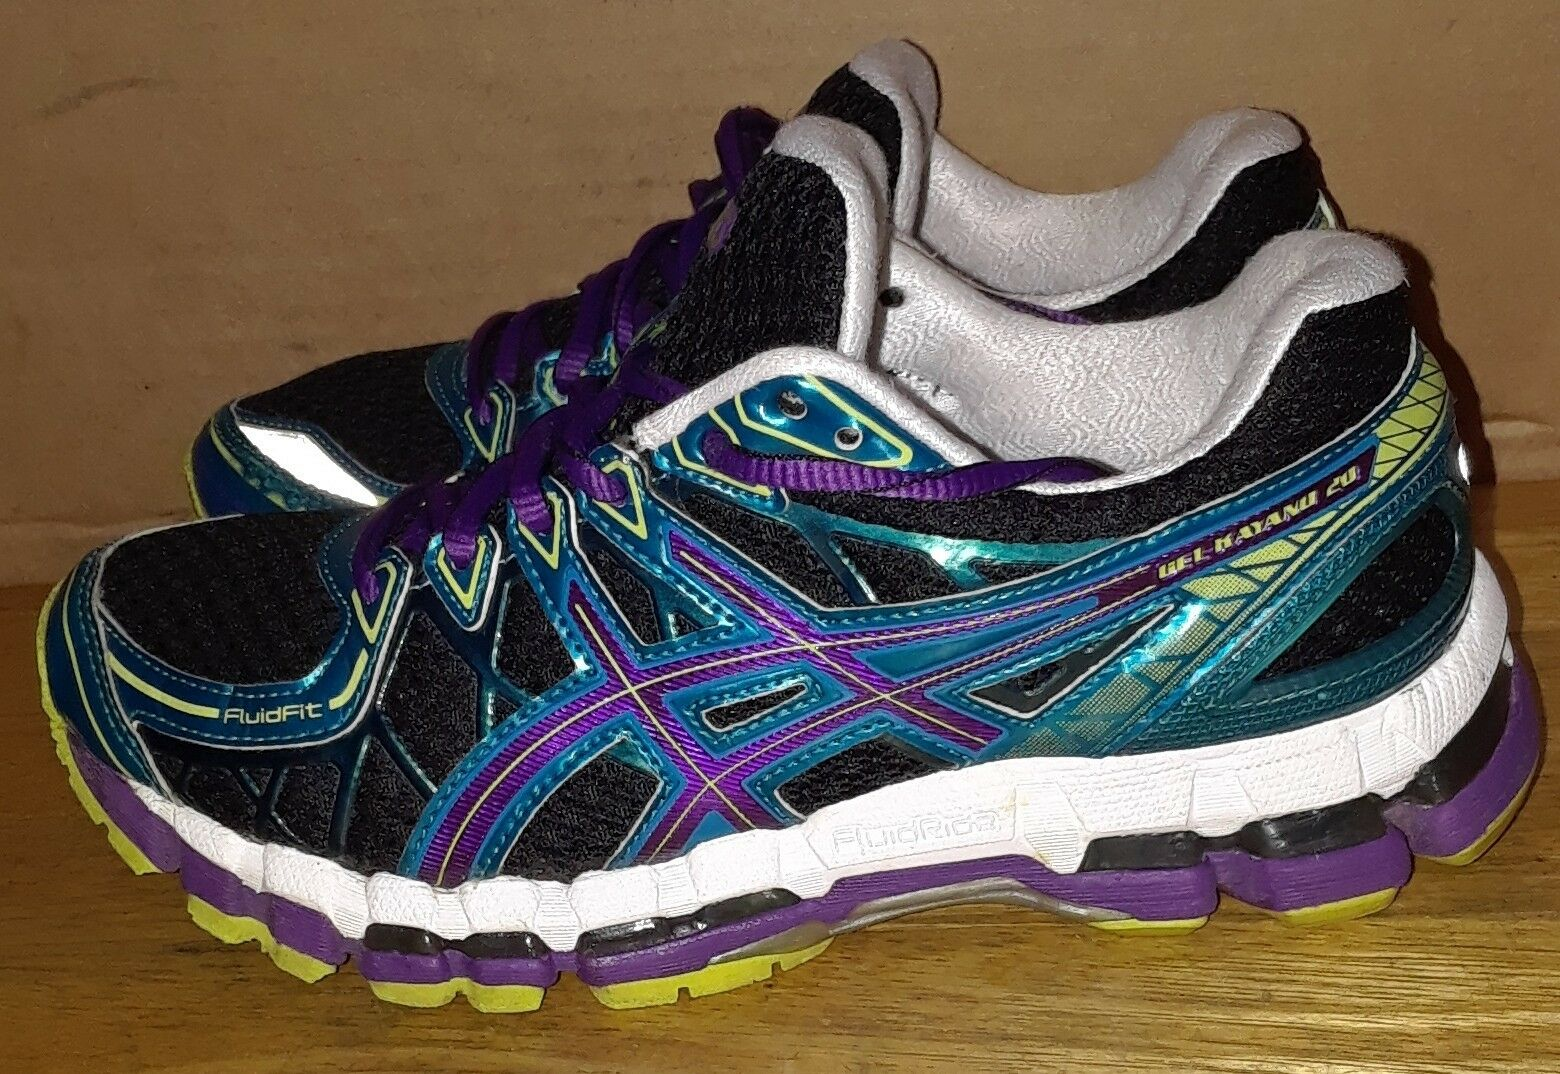 Asics Gel Kayano 20 - Running Training Women's shoes bluee Black. Sz 6